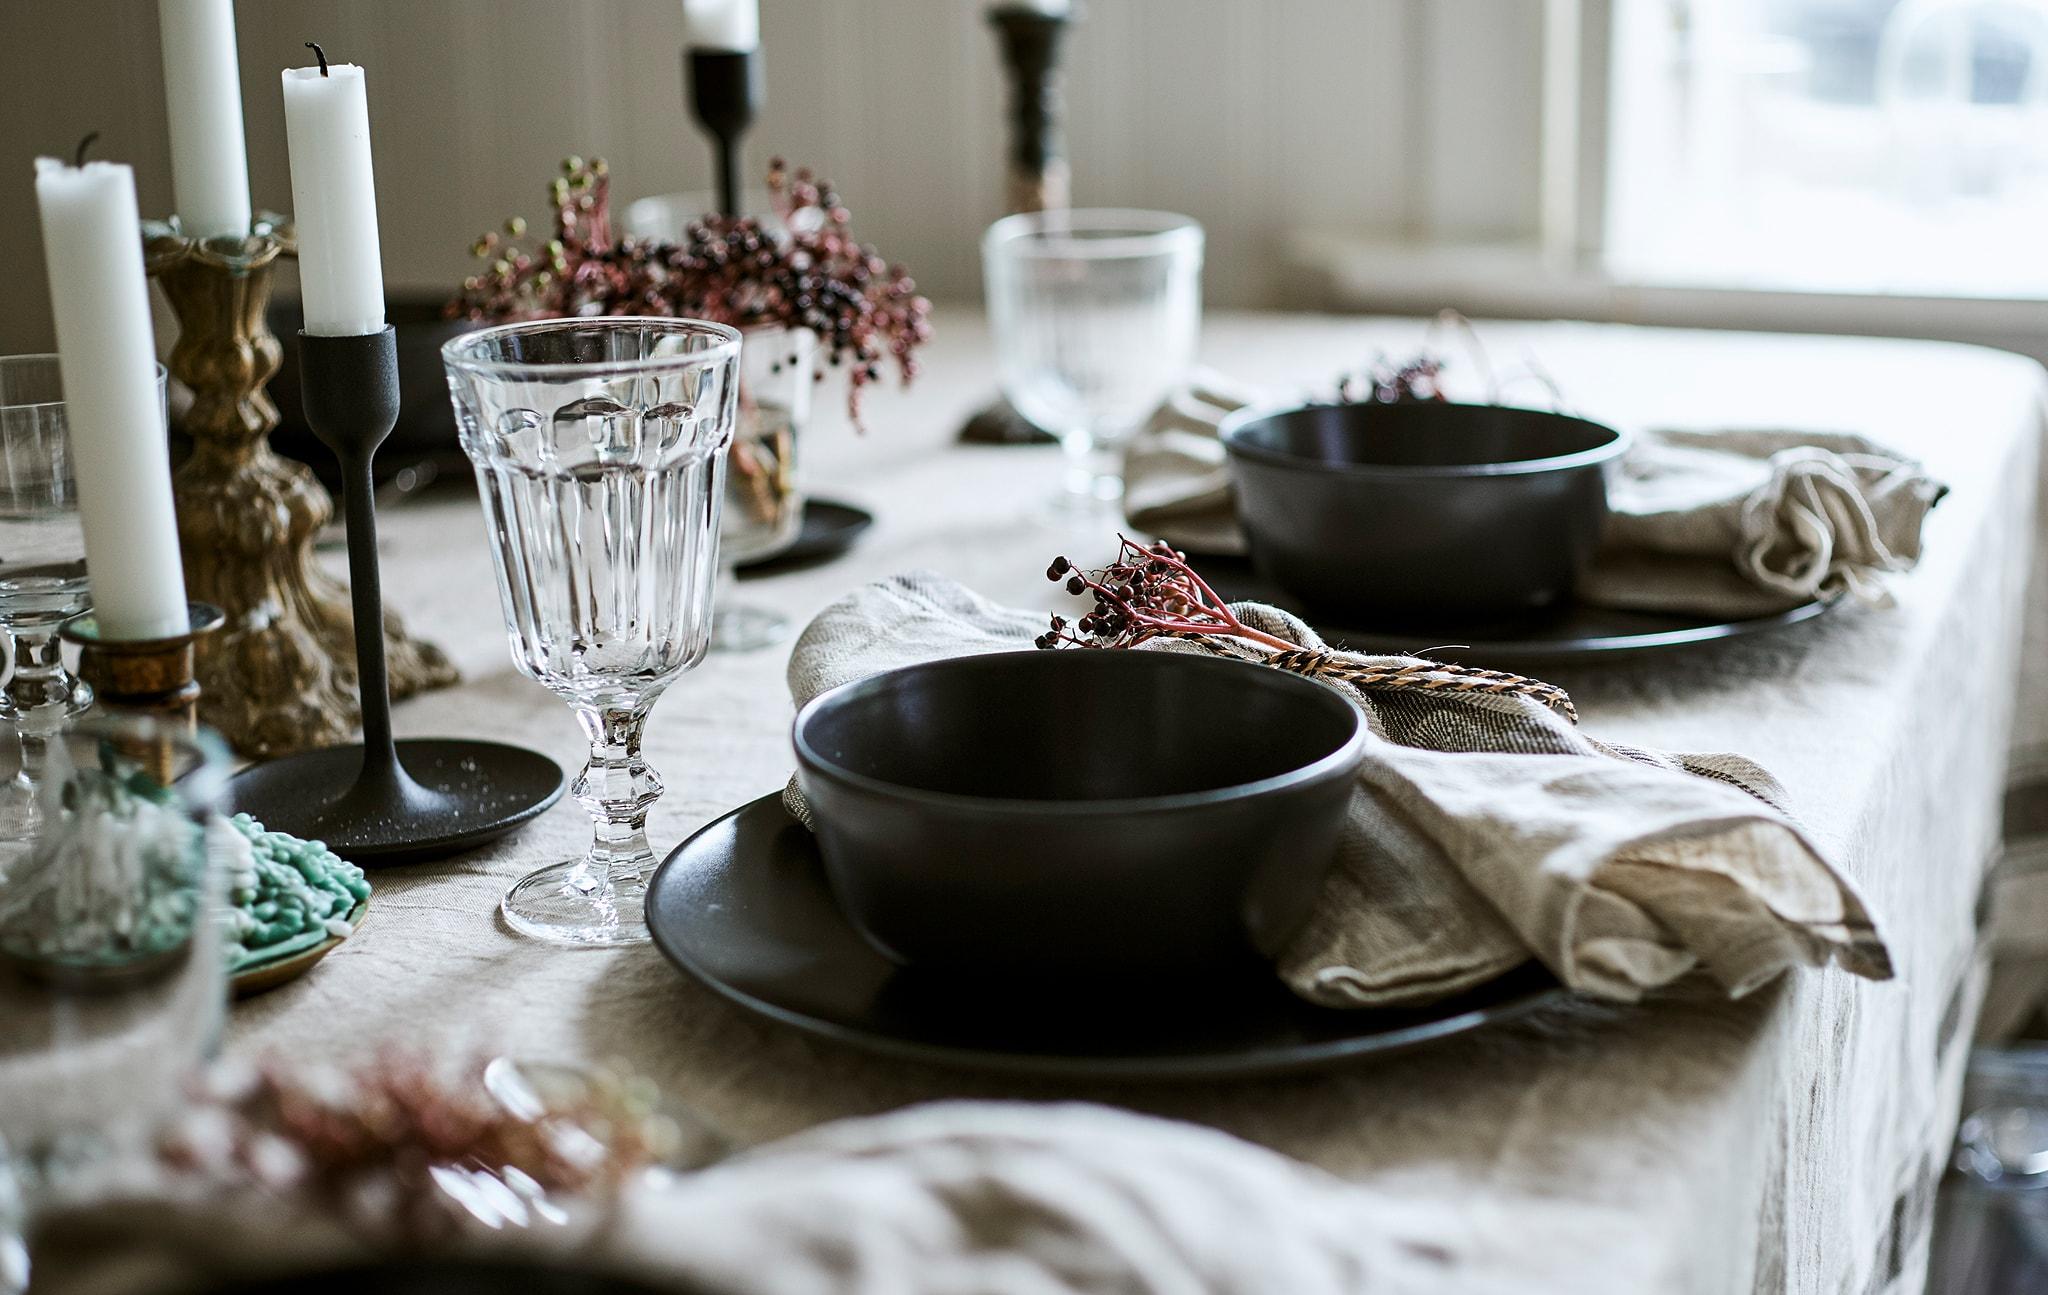 Dua penataan di atas meja yang ditutupi linen, masing-masing memiliki mangkuk abu-abu biru yang diletakkan di atas piring dengan gelas kaca dan serbet yang diikat.